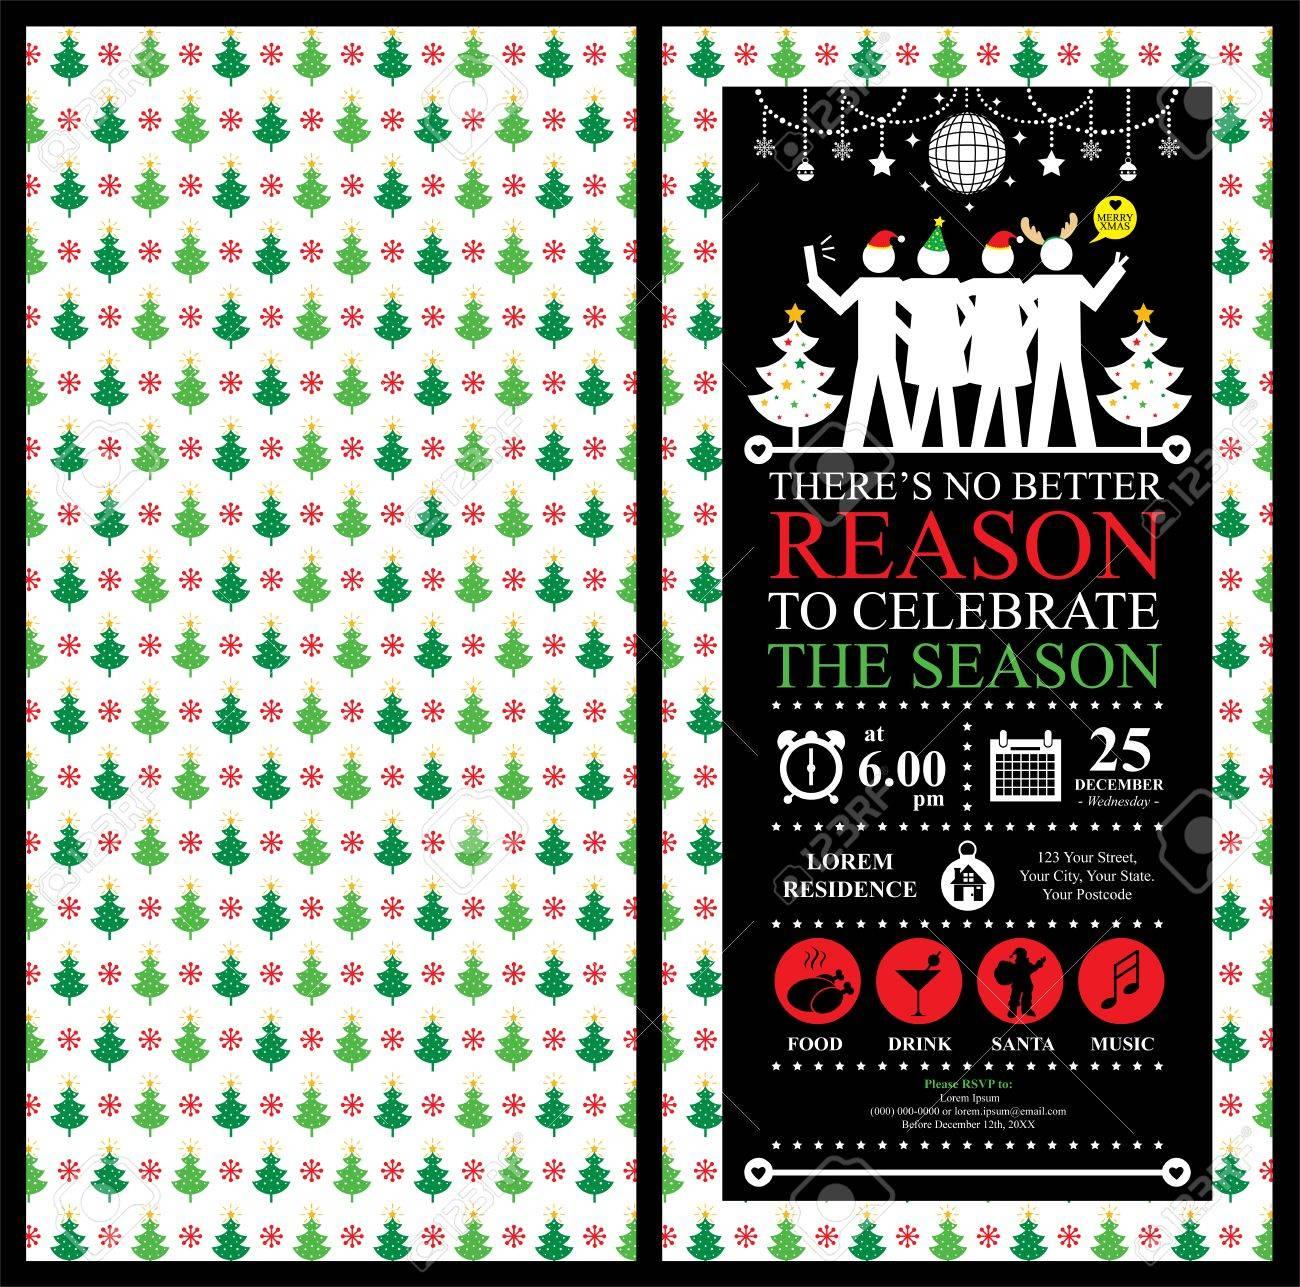 Christmas Party Invitation Card - 39093947